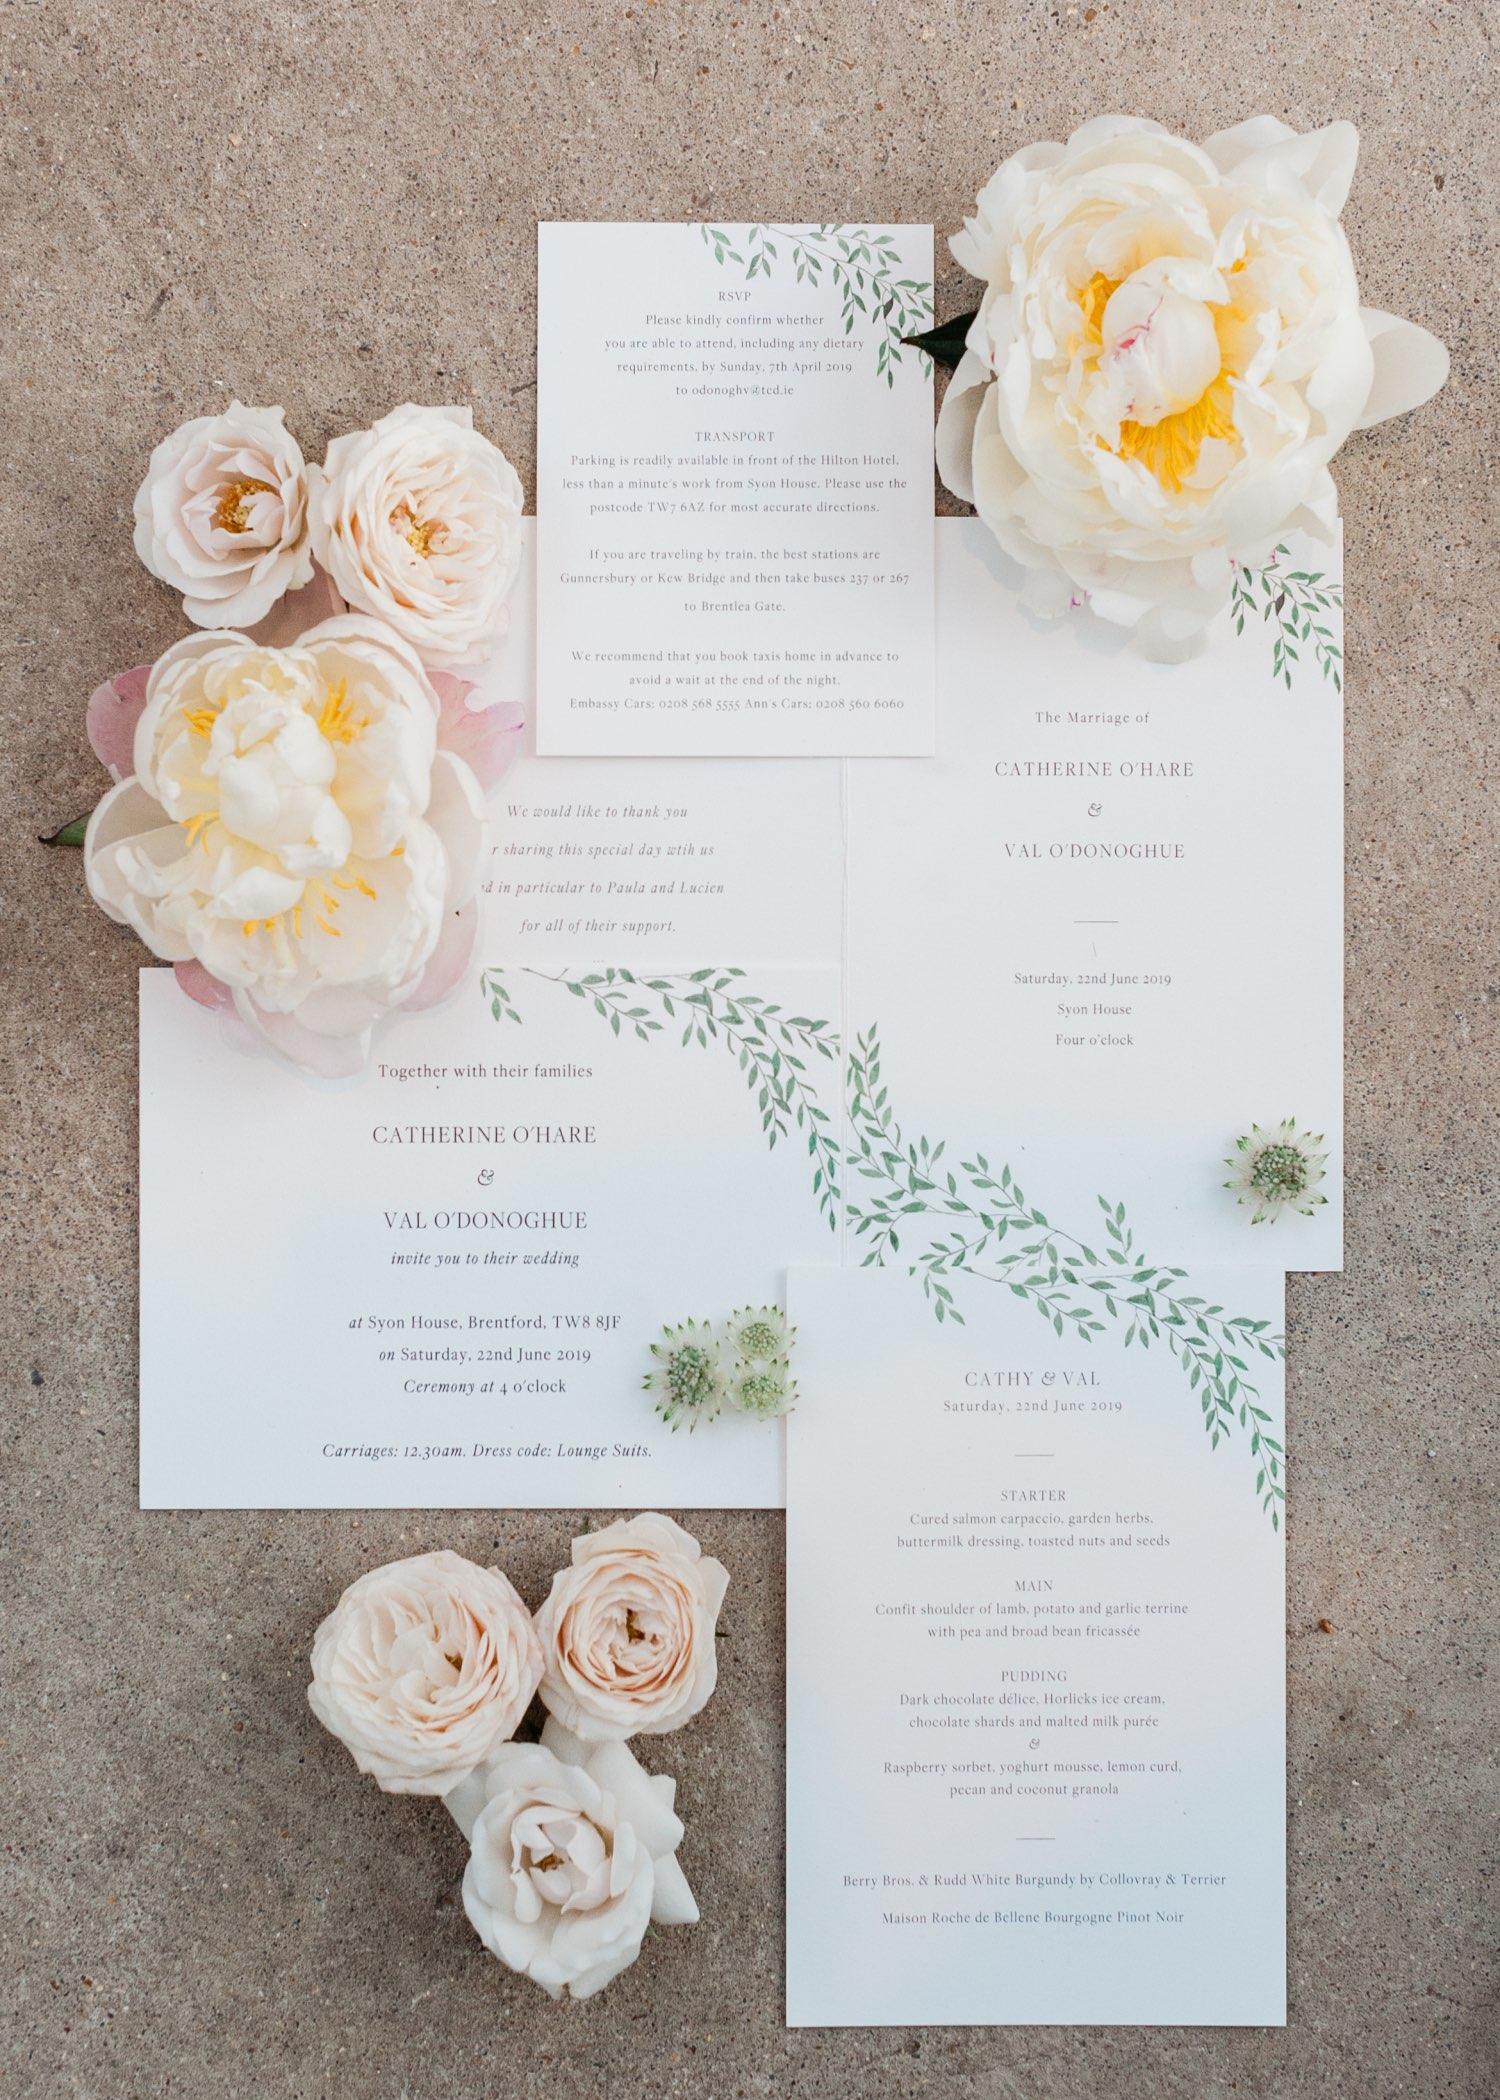 Littleton-Rose-Syon-House-London-Wedding-Planner-Botanical-stationery.jpg